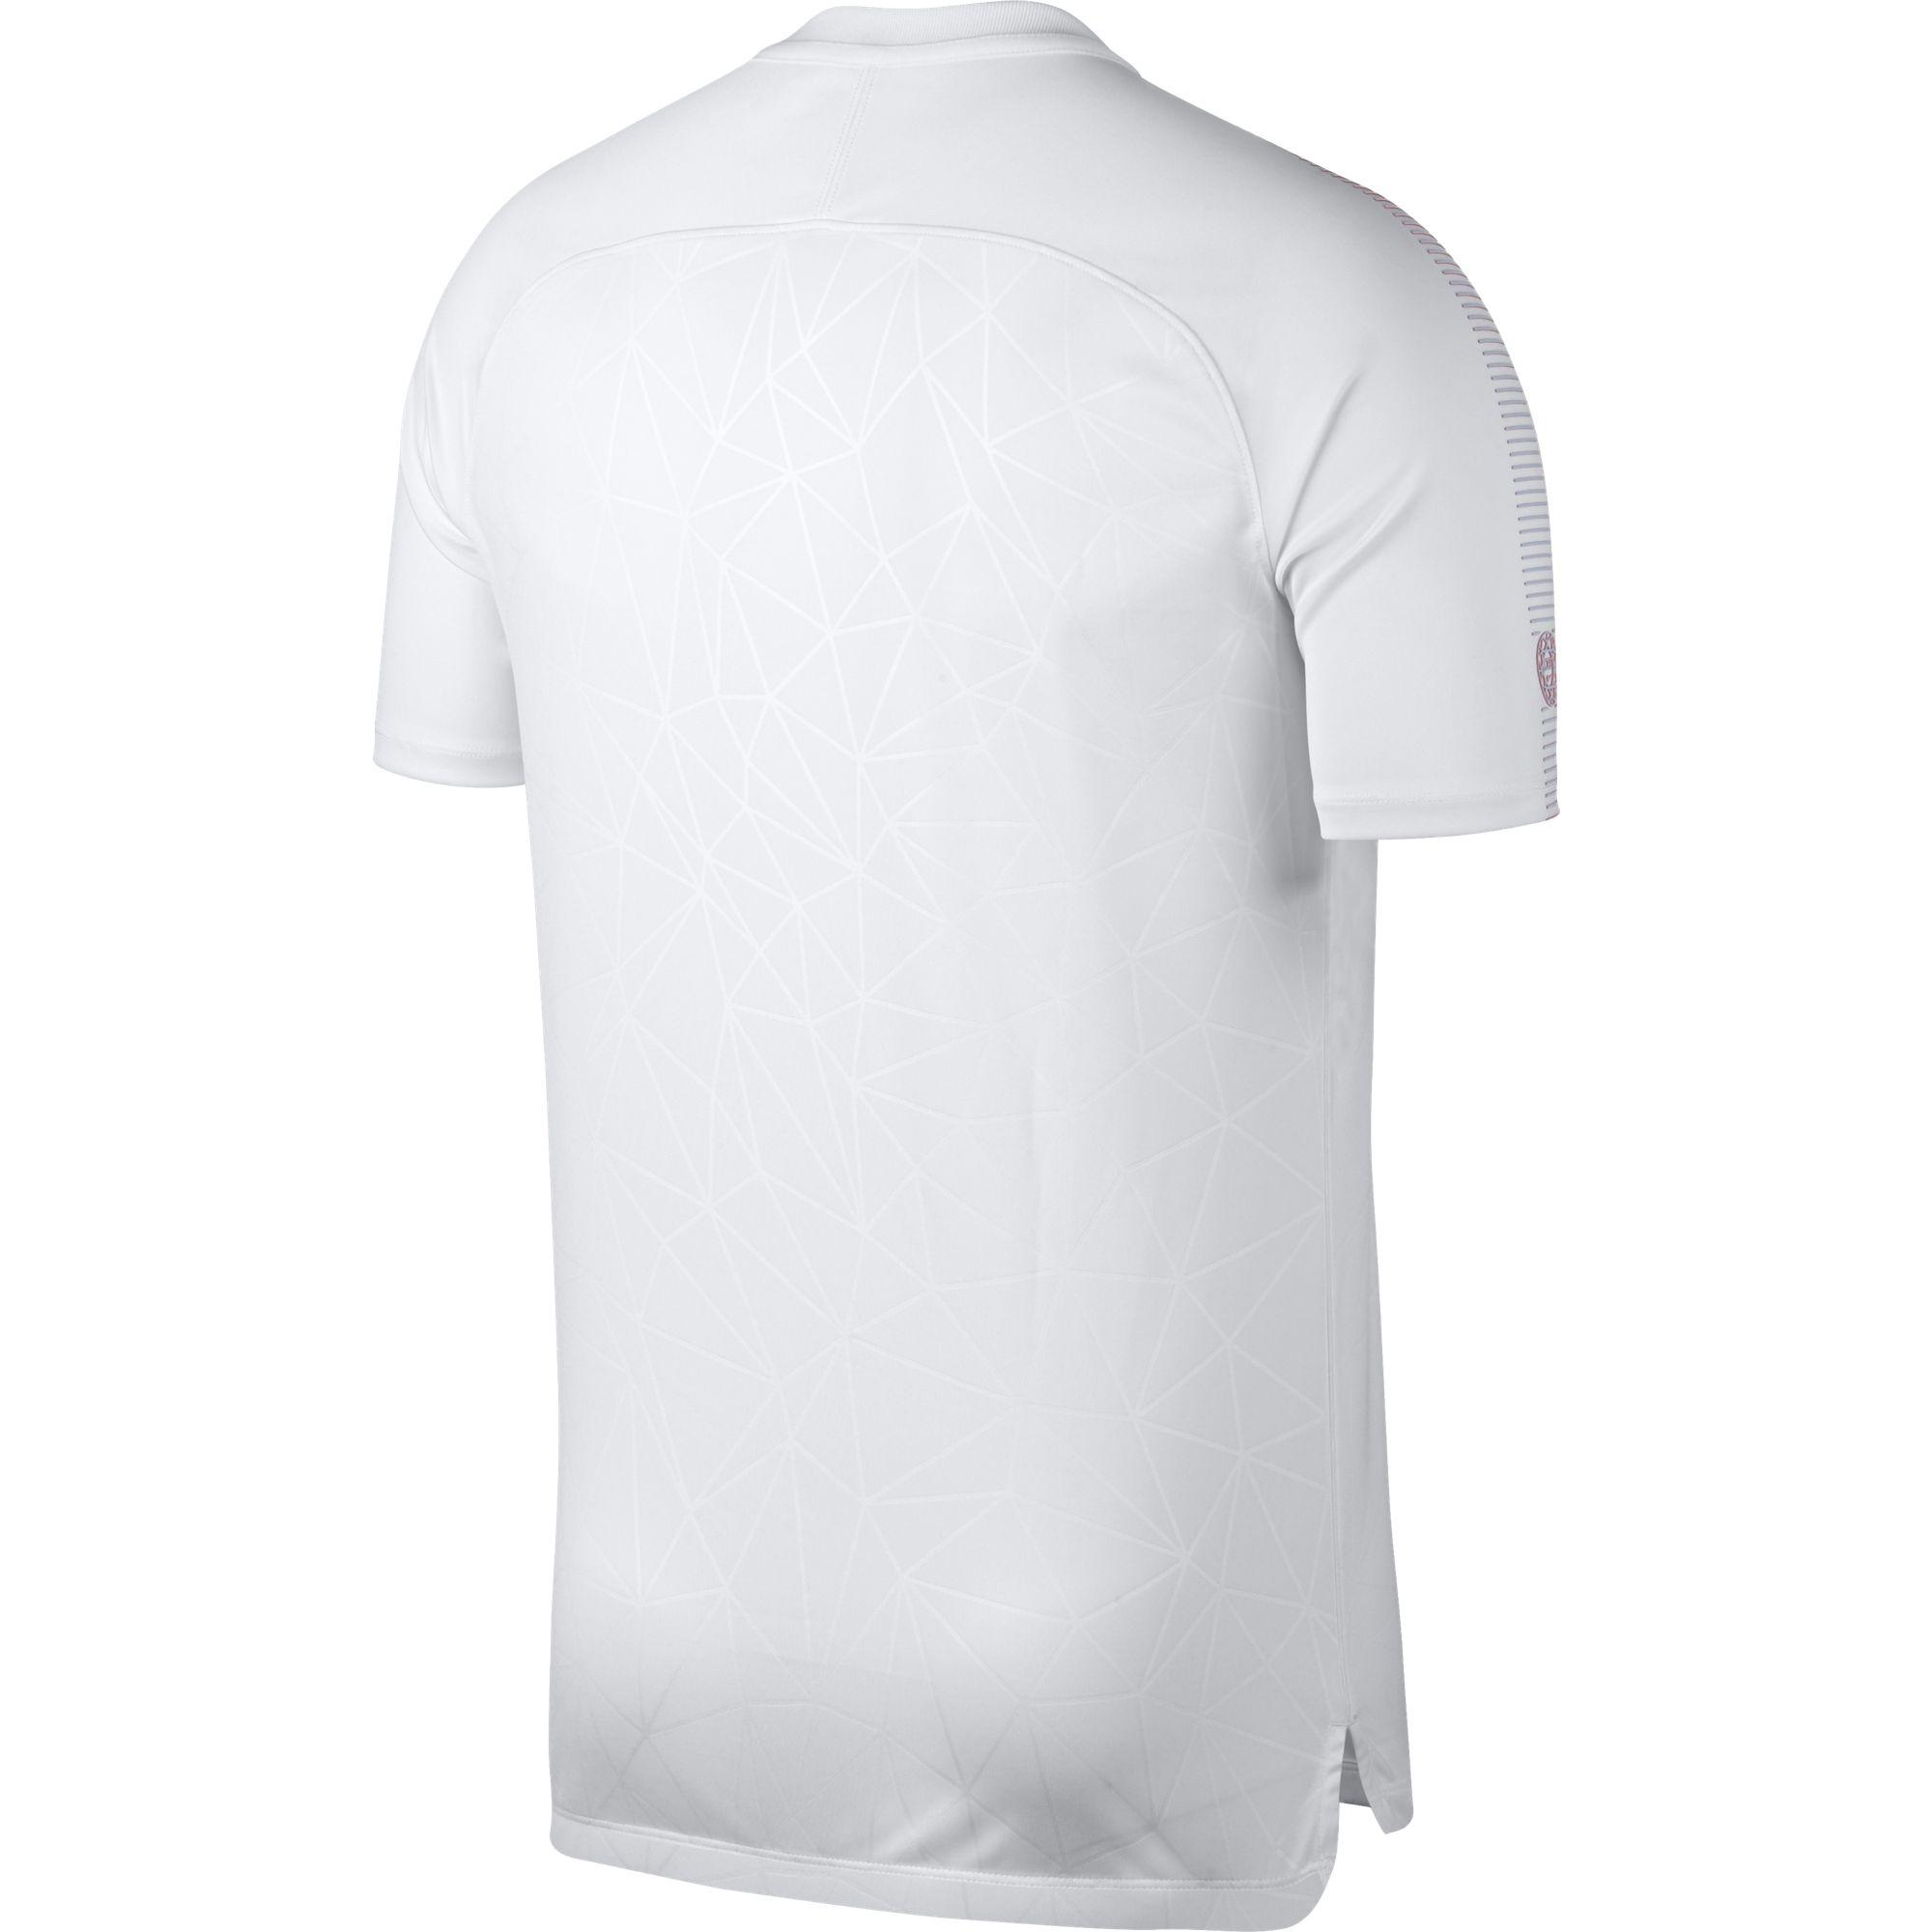 6d699b1bcd8d9a Nike Dry CR7 Squad Jersey - Herren T-Shirt Funktionsshirt - 882991 ...